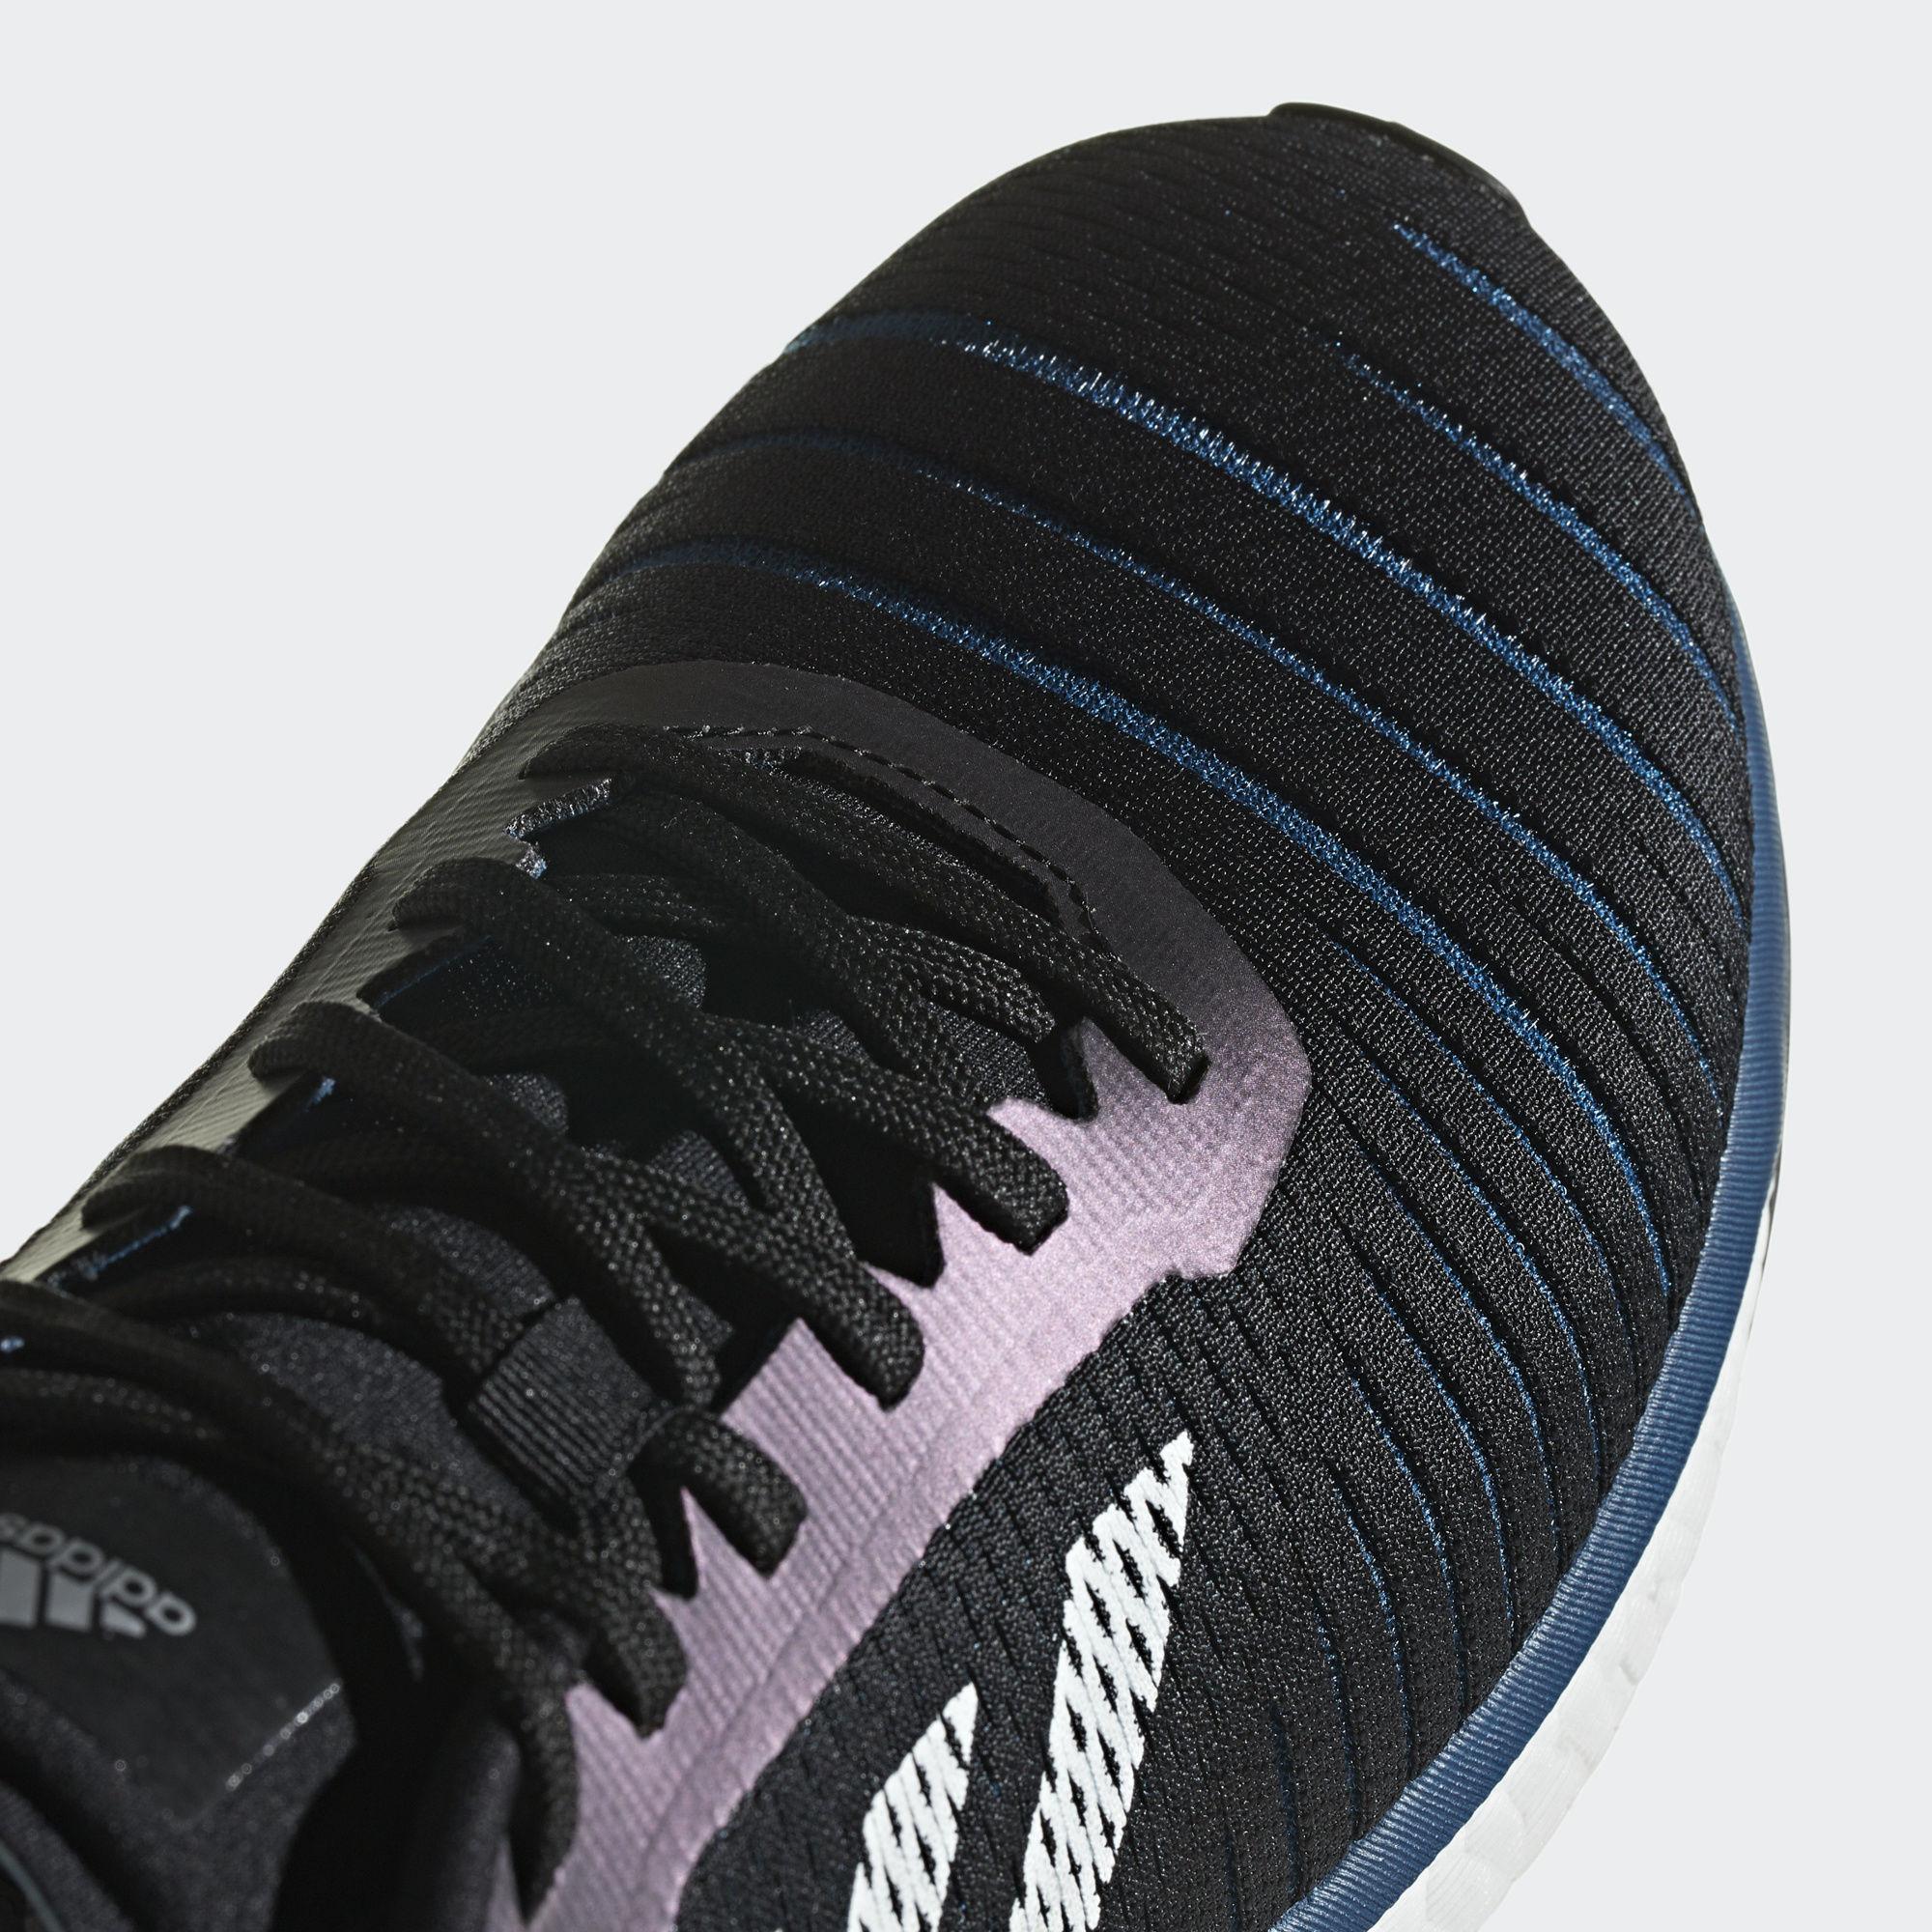 2231a47f Кроссовки для бега Solar Drive D97442 adidas Performance - Украина ...